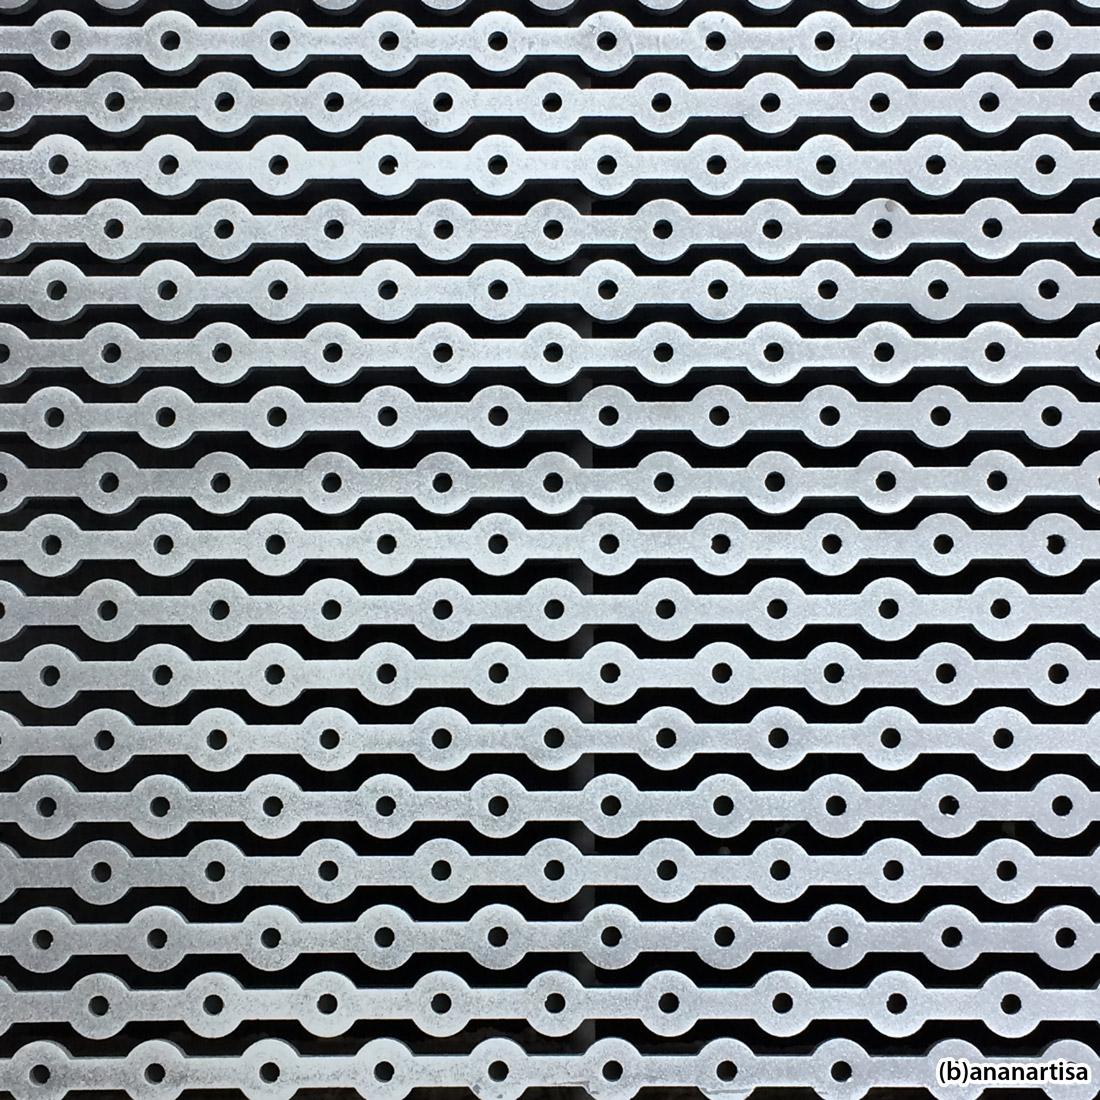 optical tombino: photography by (b)ananartista sbuff